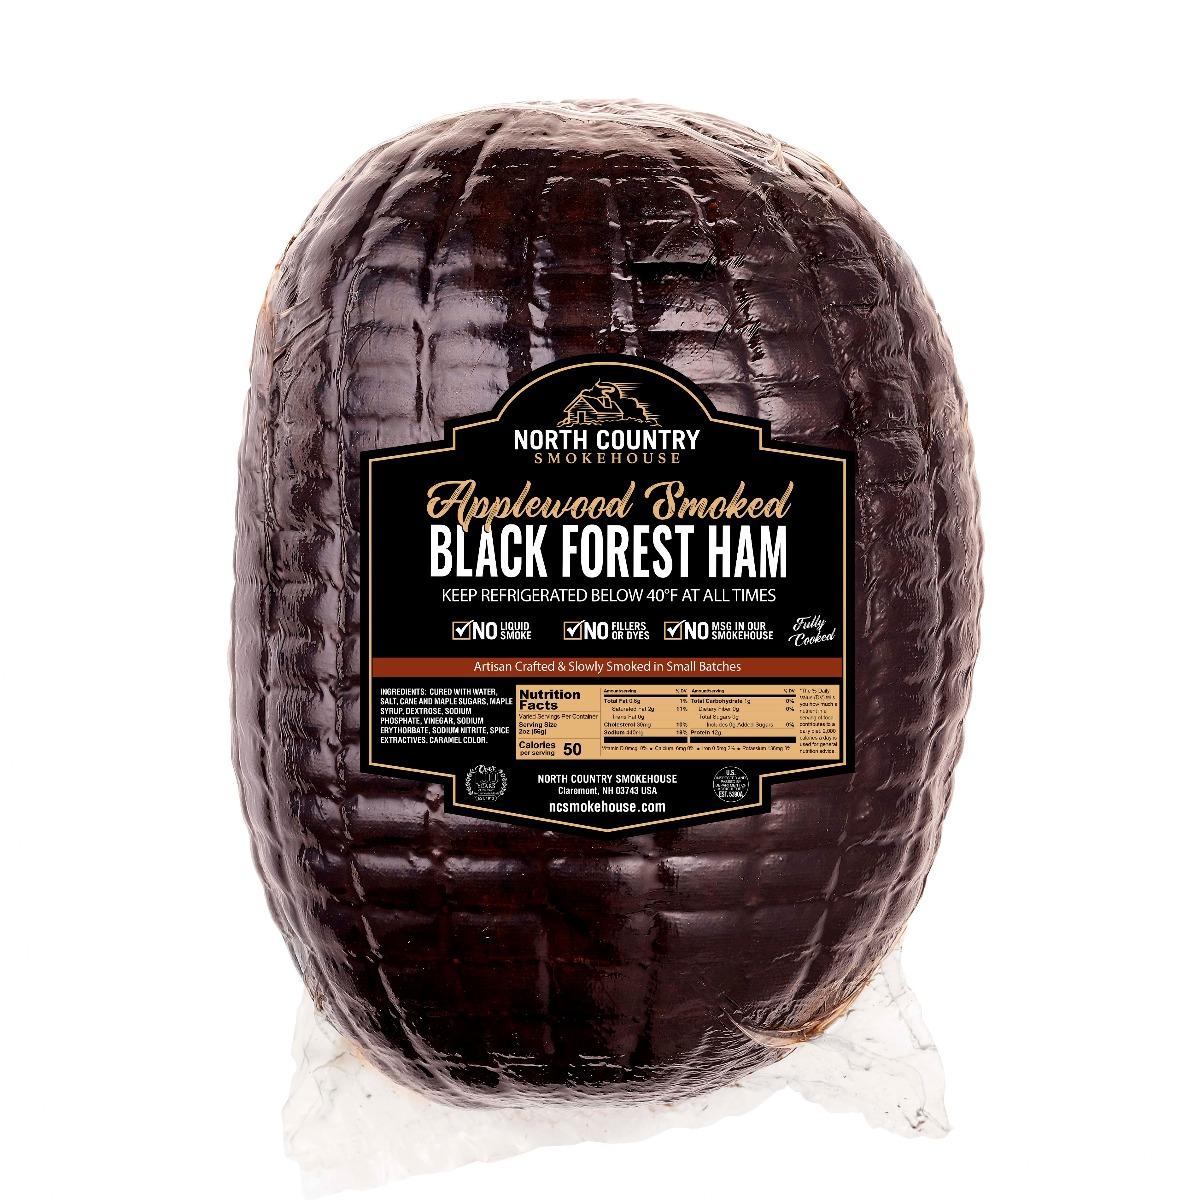 Original Boneless Black Forest Whole Ham - 1, 8-9 lb.